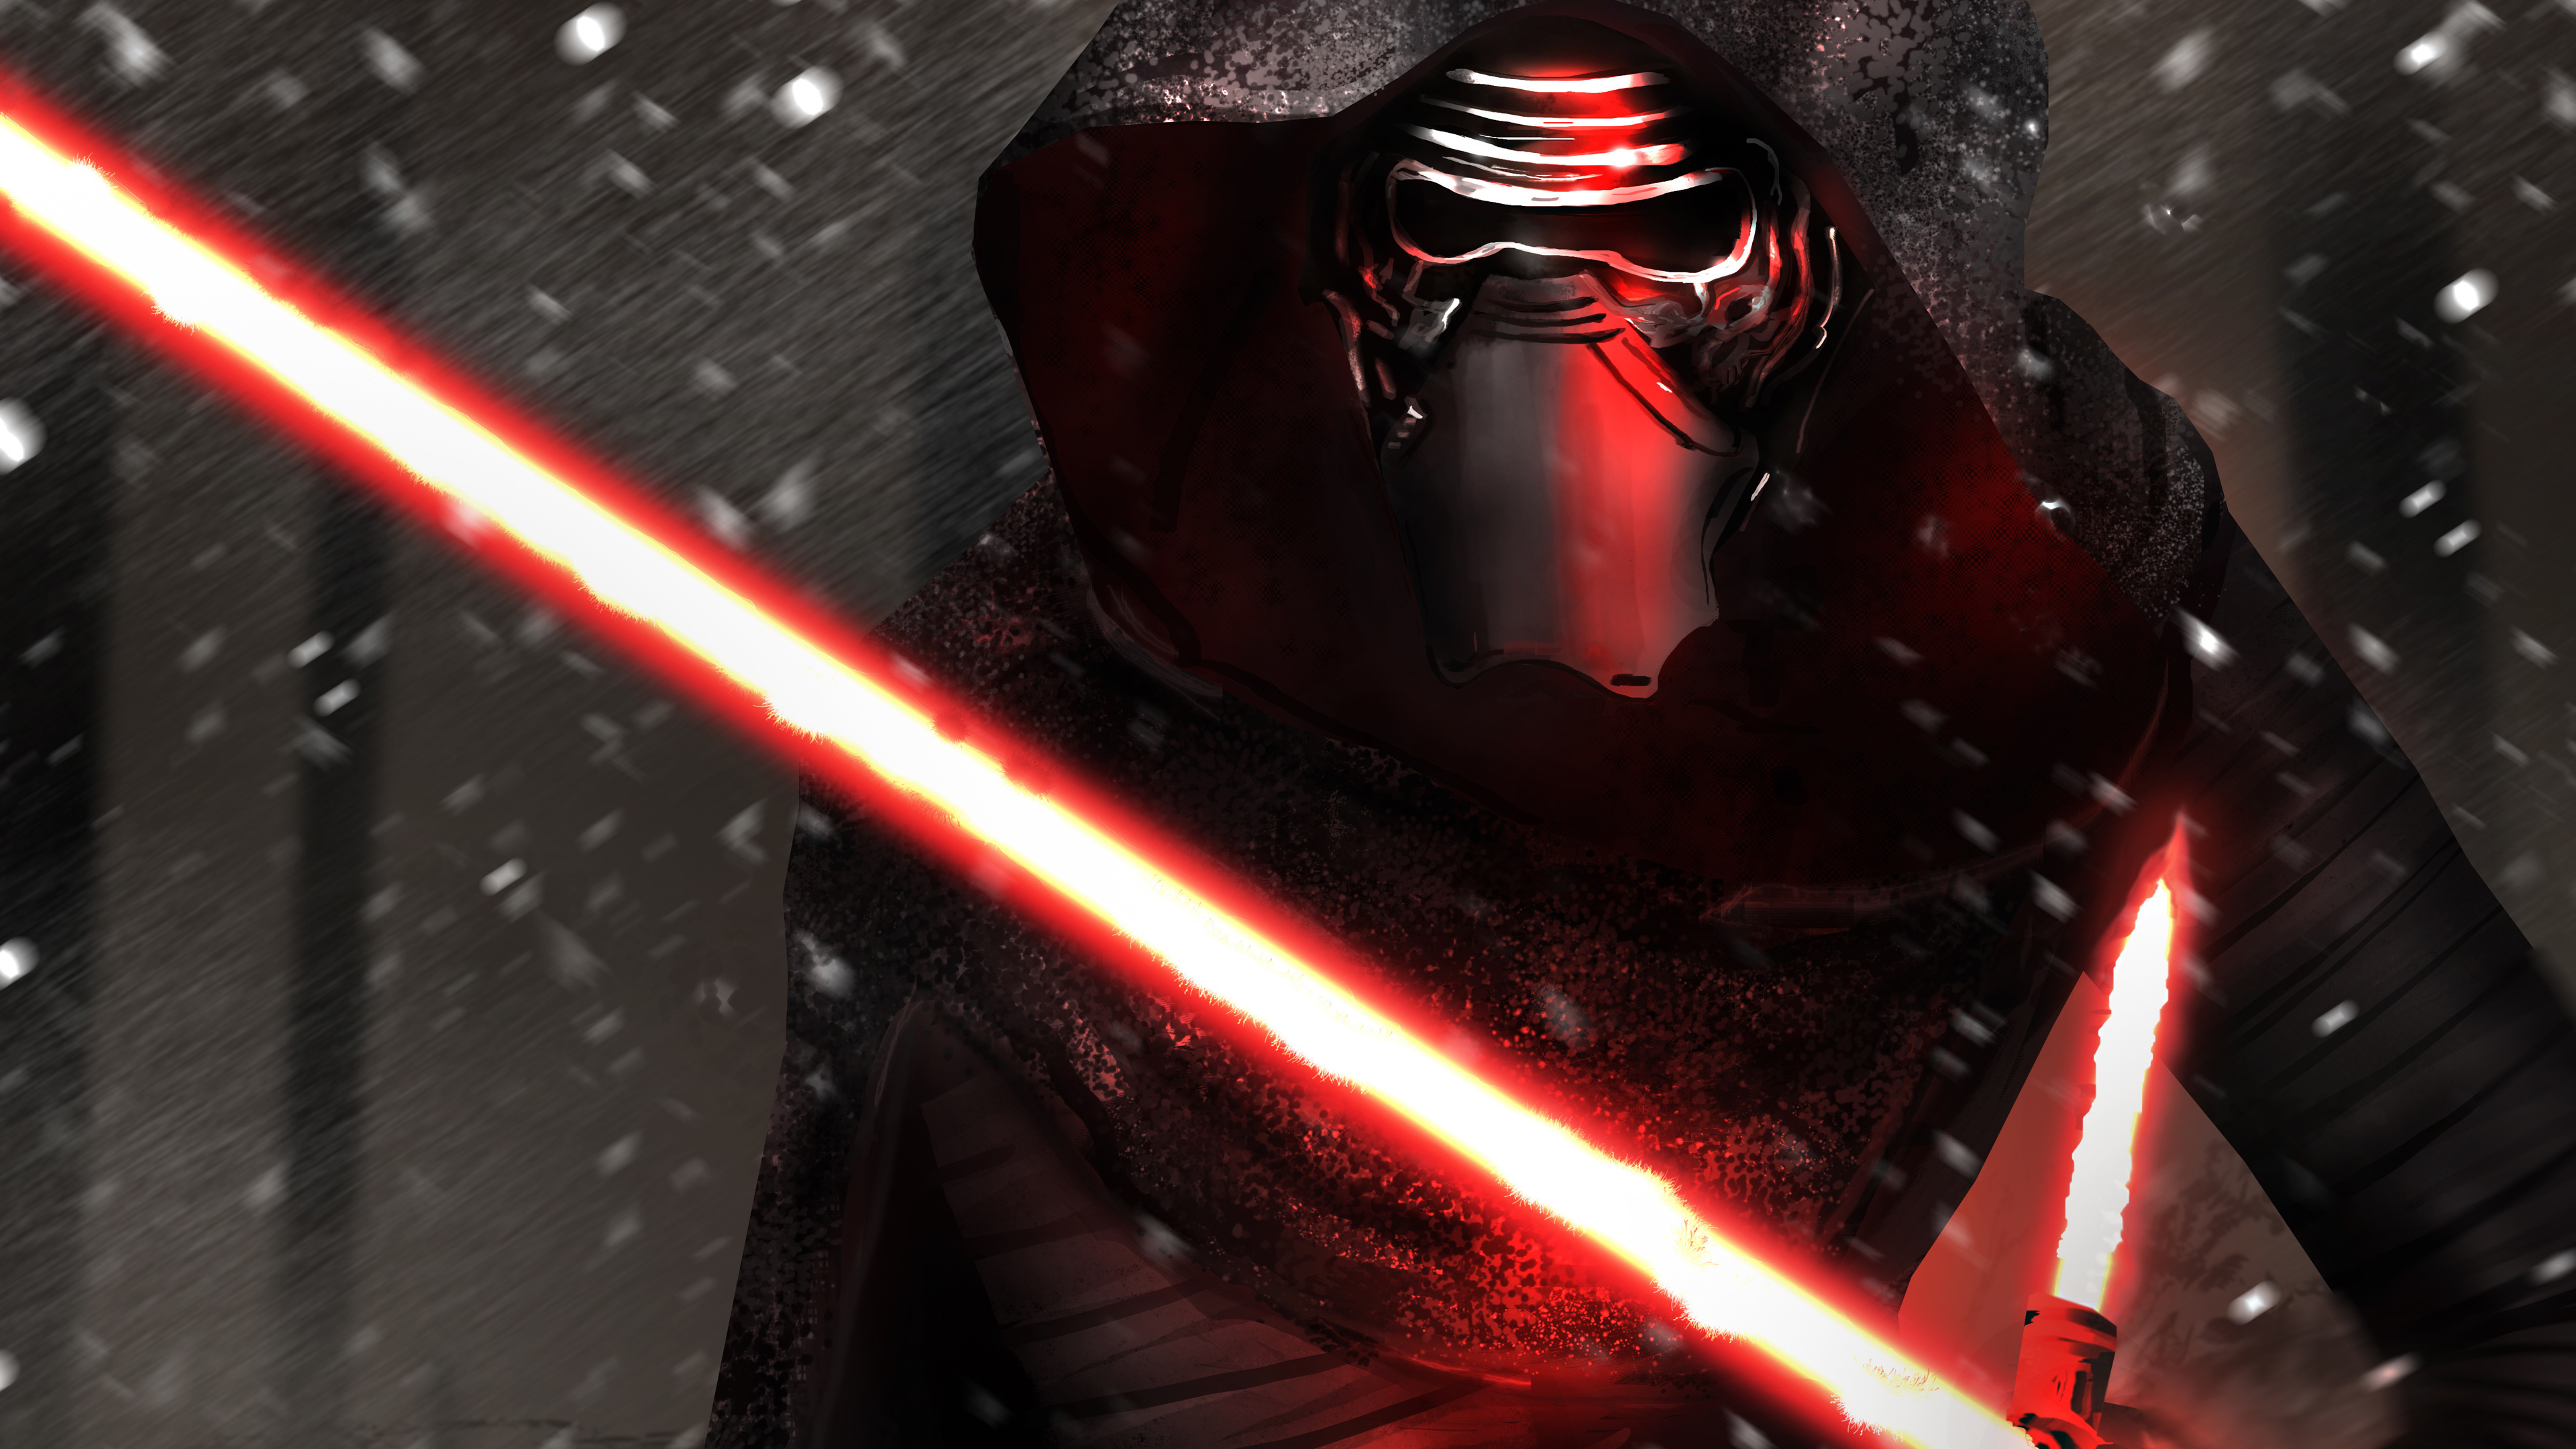 Desktop Wallpaper Kylo Ren Star Wars Villain Artwork 4k Hd Image Picture Background 5e361f